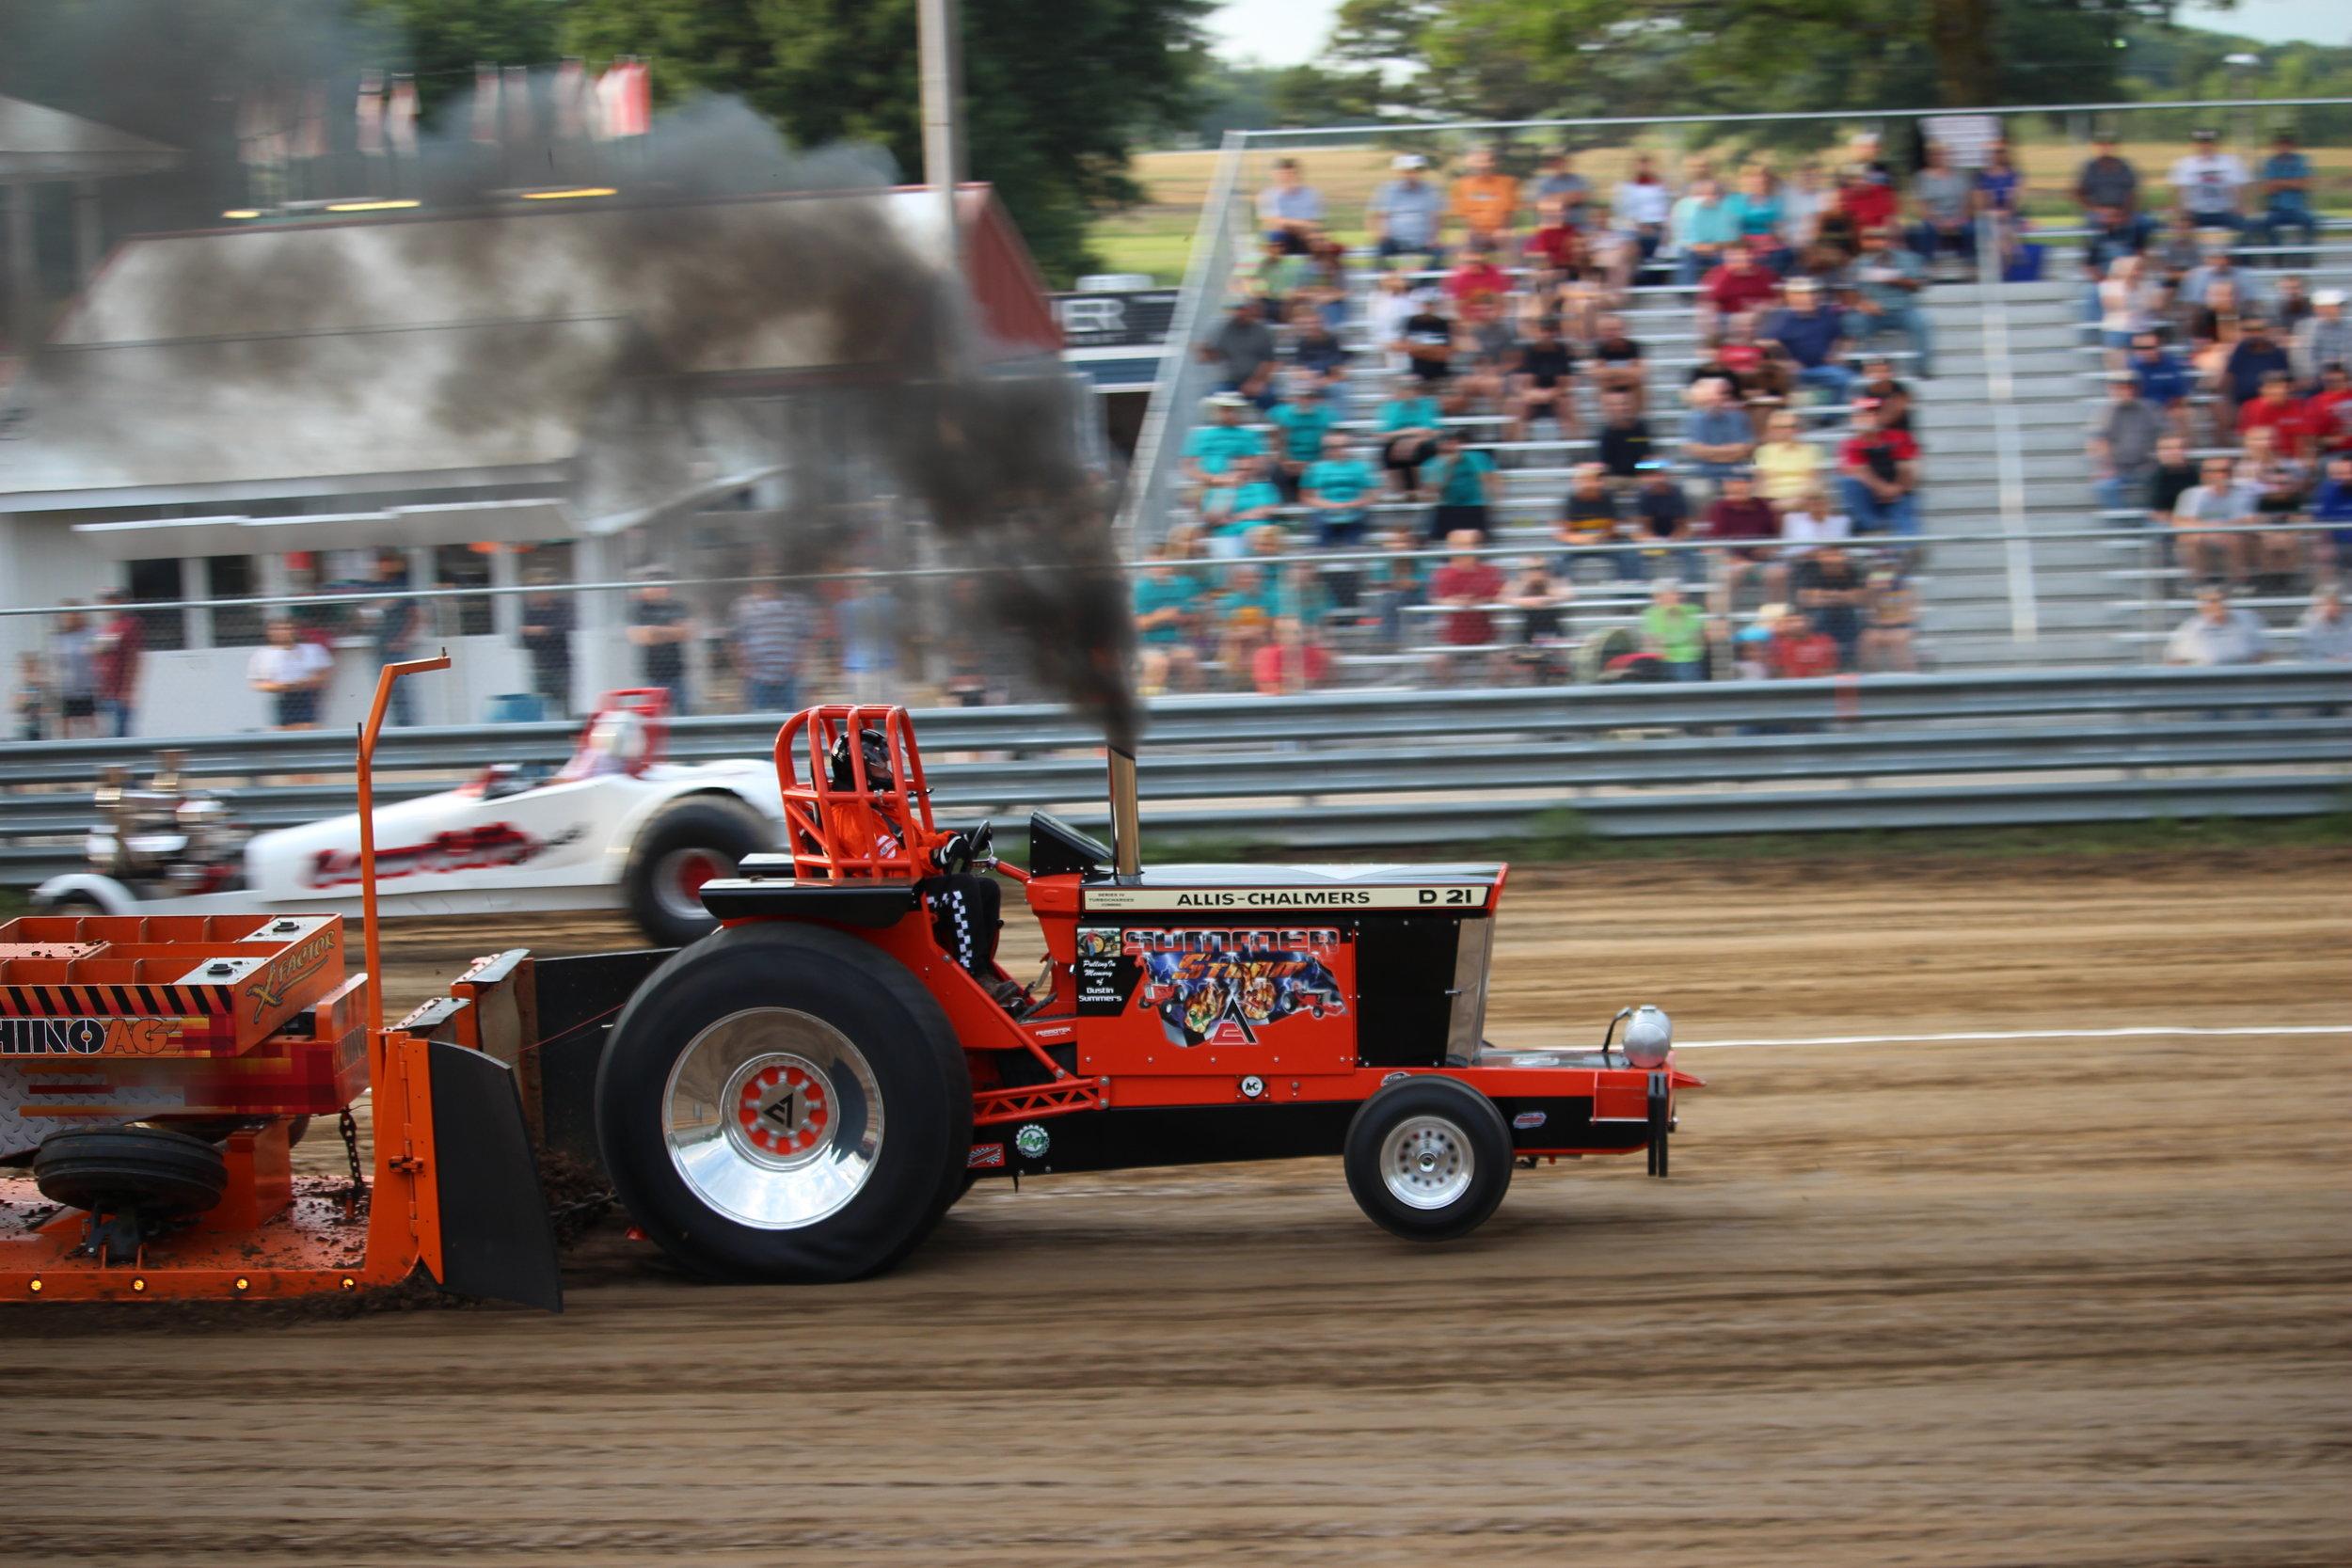 tractor pull 5.JPG